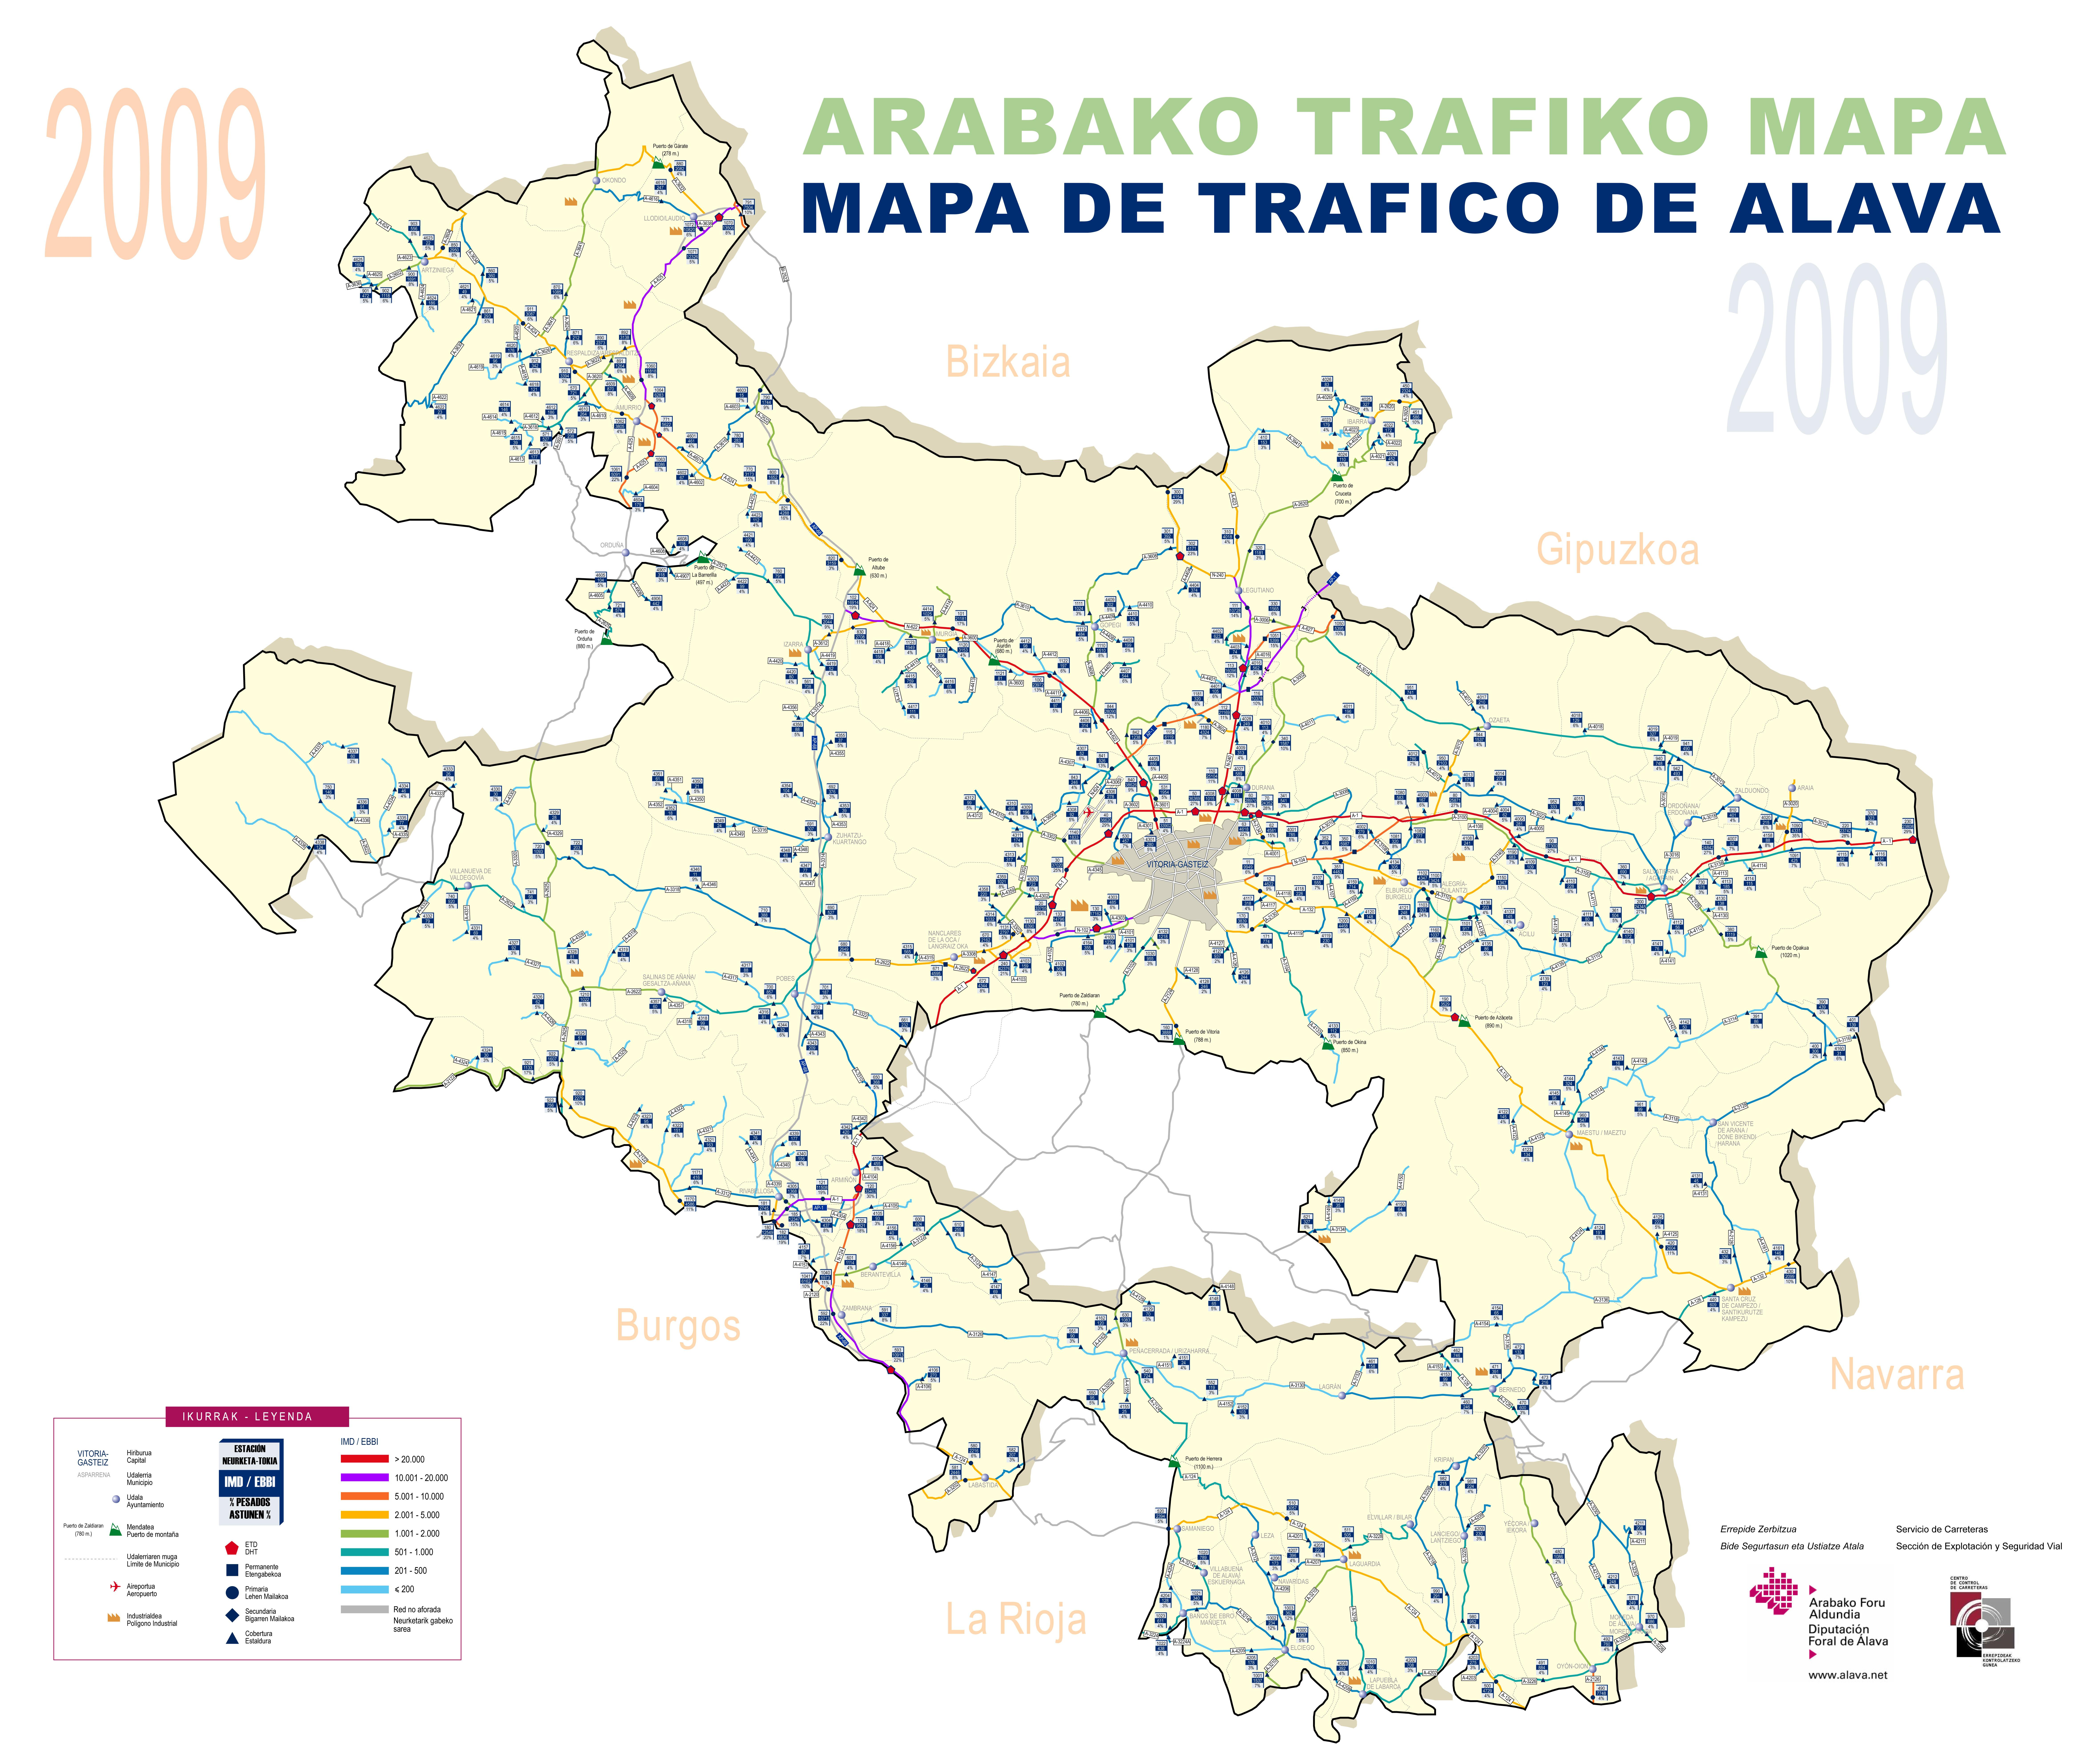 Traffic map of Álava 2009